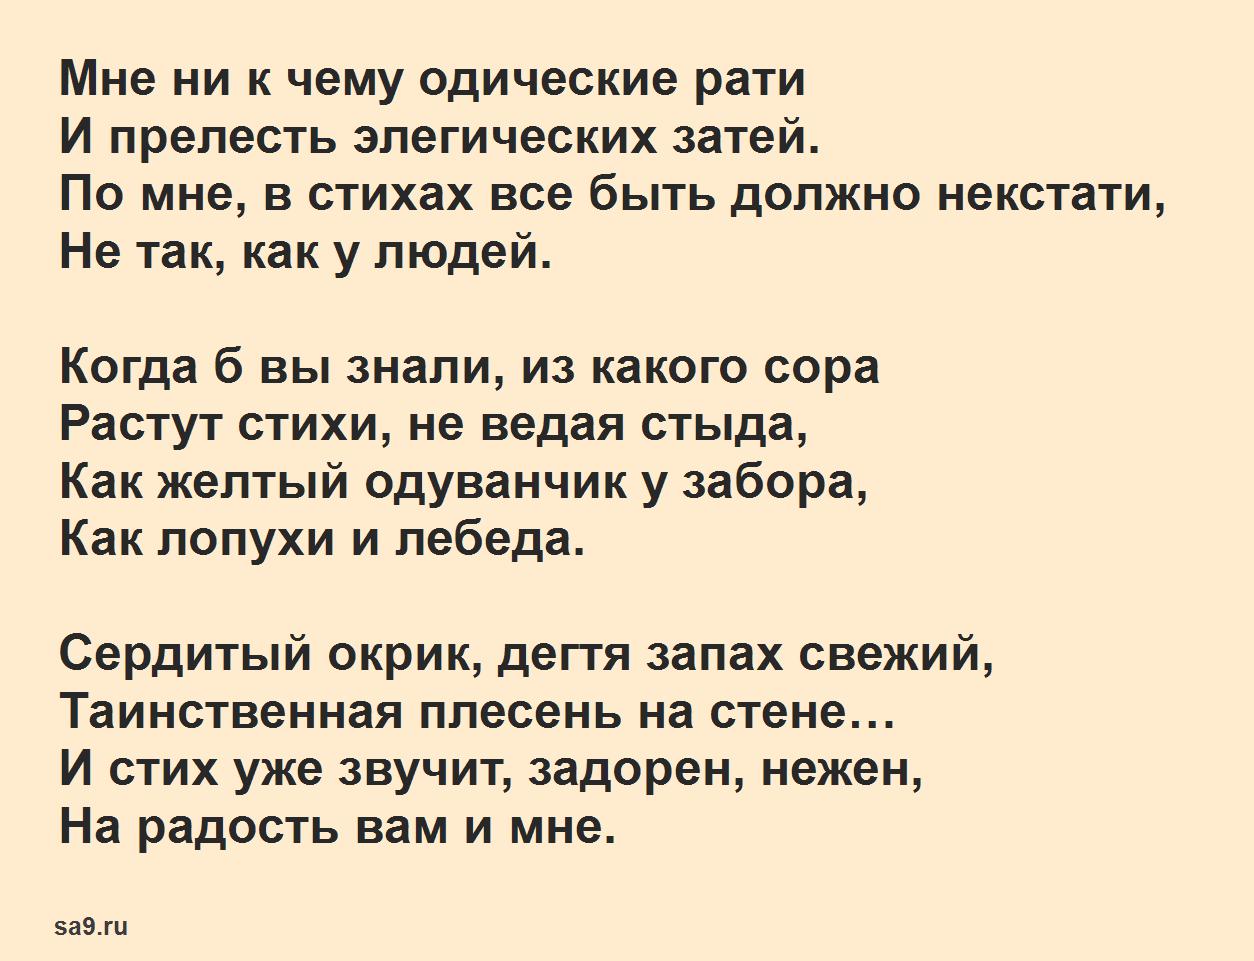 Ахматова стихи - Мне ни к чему одические рати, 12 строк